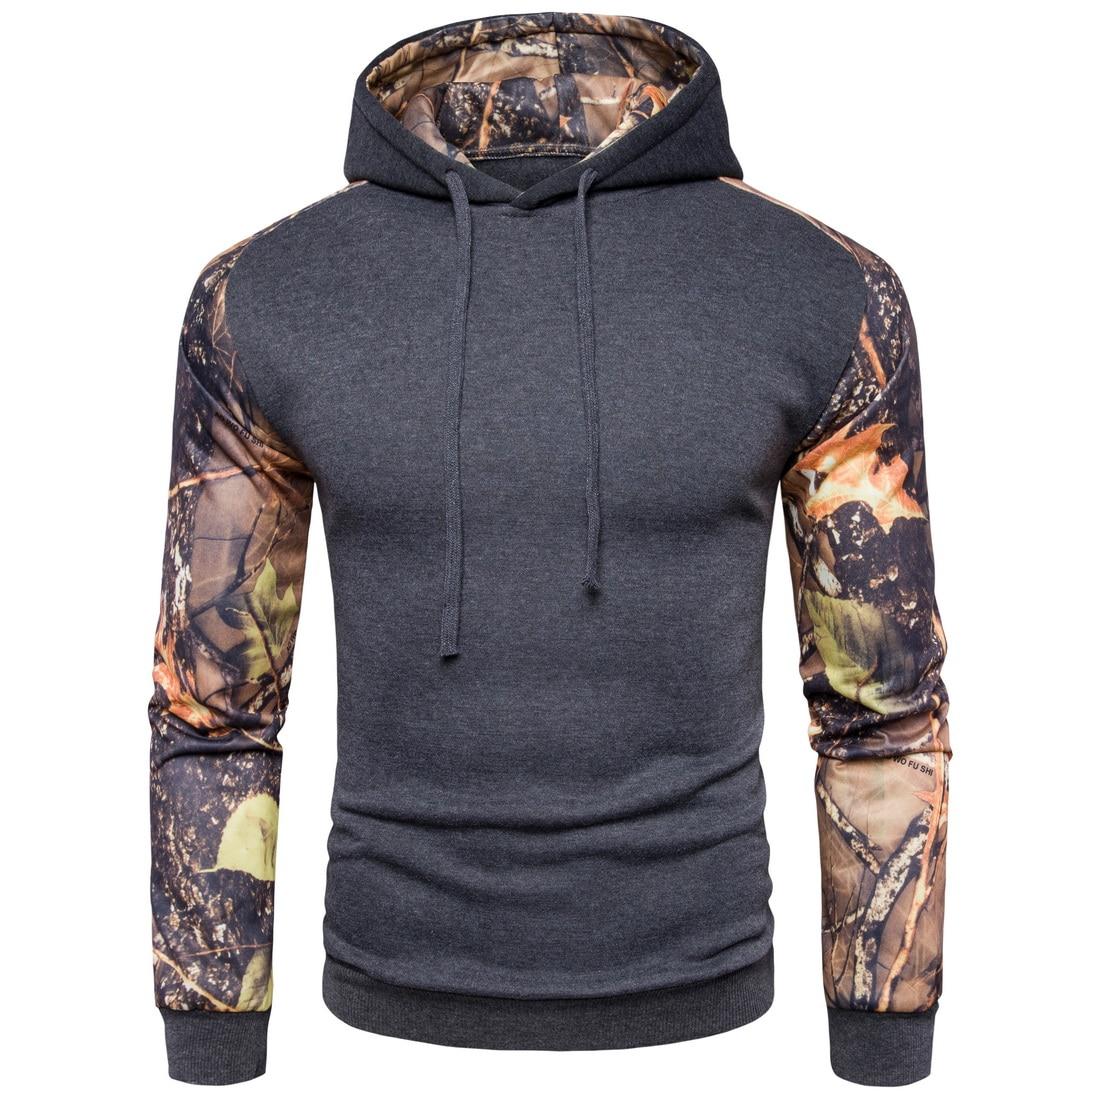 Brand 2017 Hoodie Printing Stitching Hoodies Men Fashion Tracksuit Male Sweatshirt Hoody Mens Purpose Tour XXL